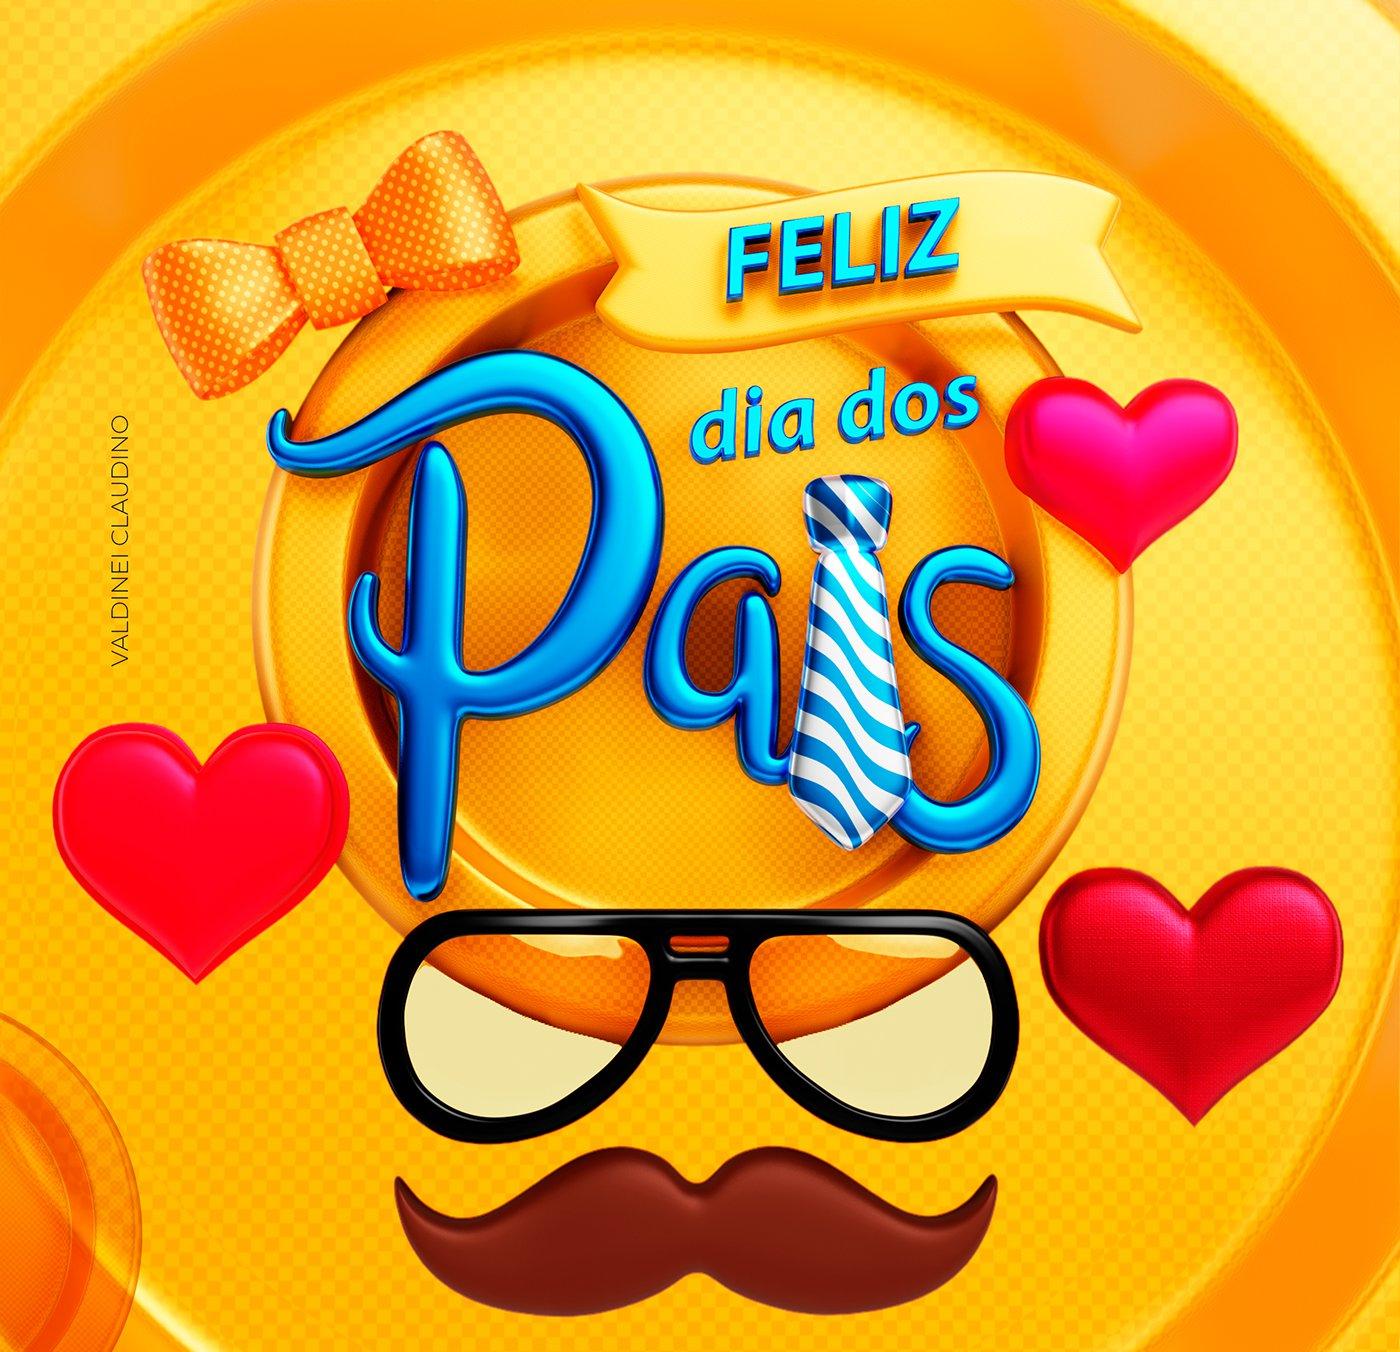 Растровый пак Elements 3D - Dia dos Pais в формате png